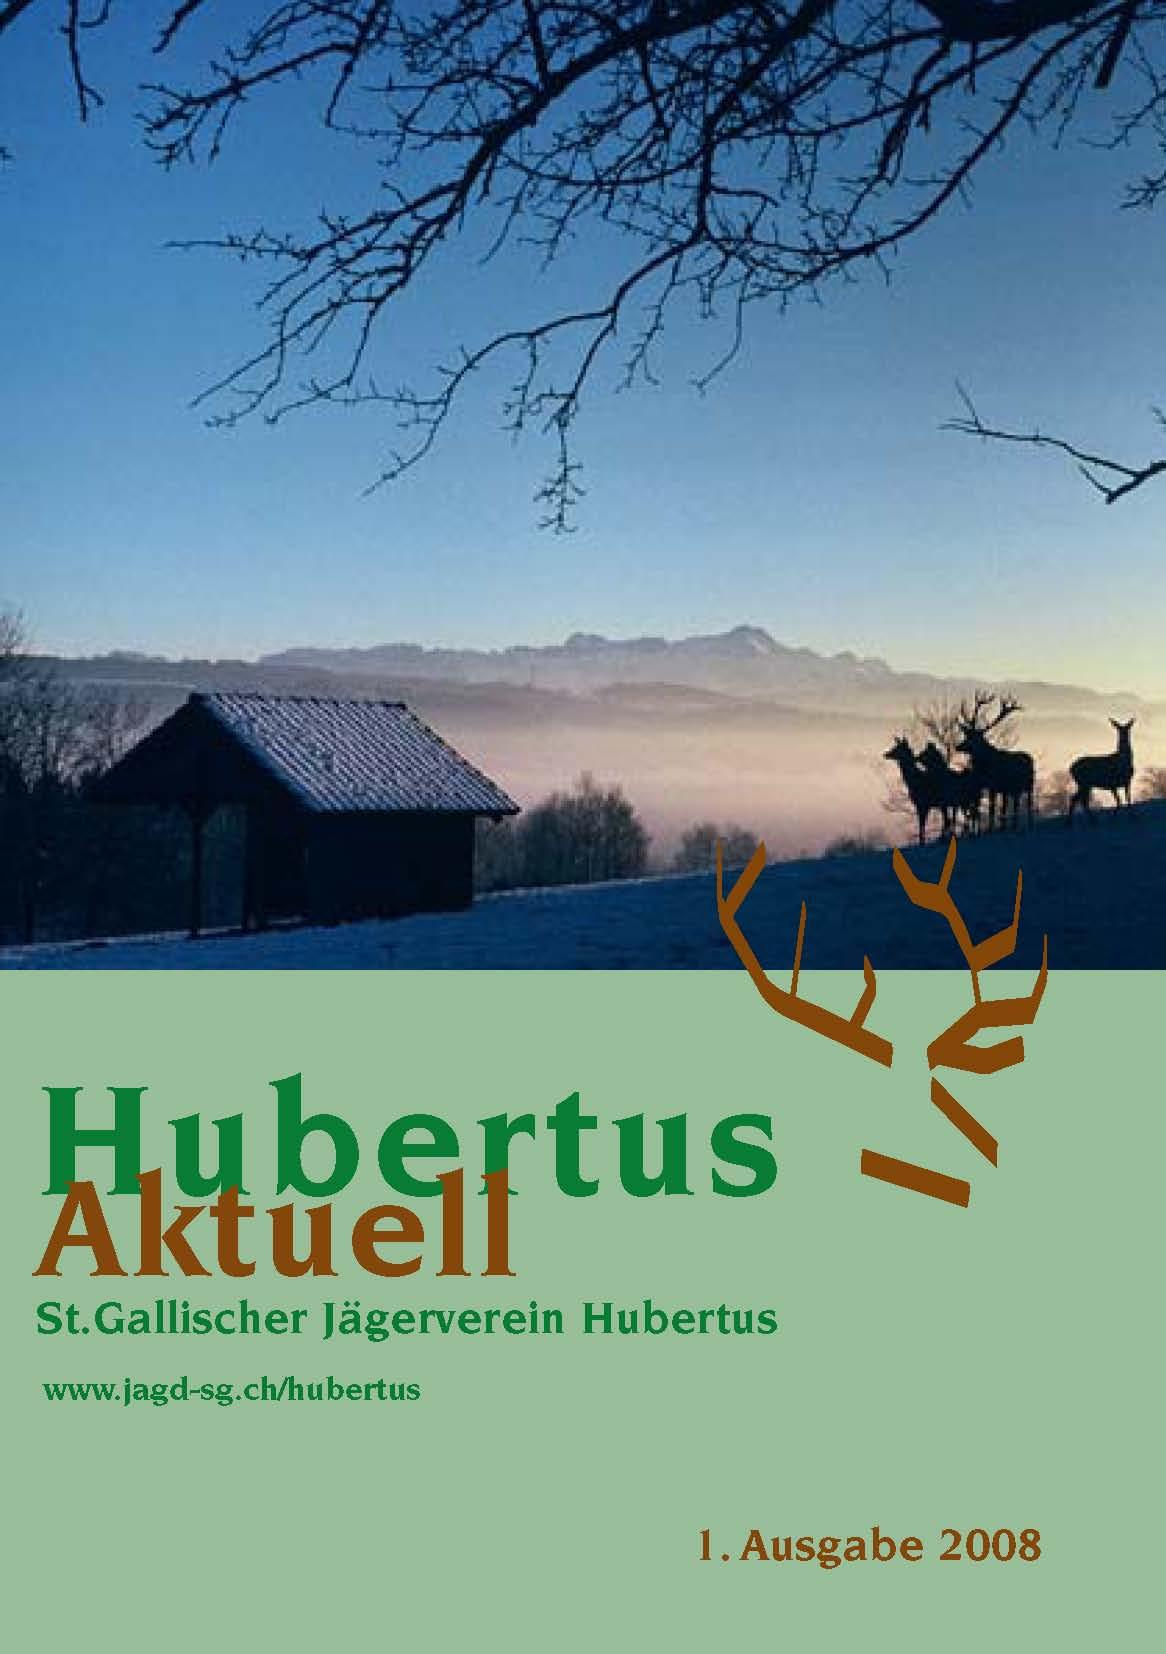 hubertus akutell 01 2008